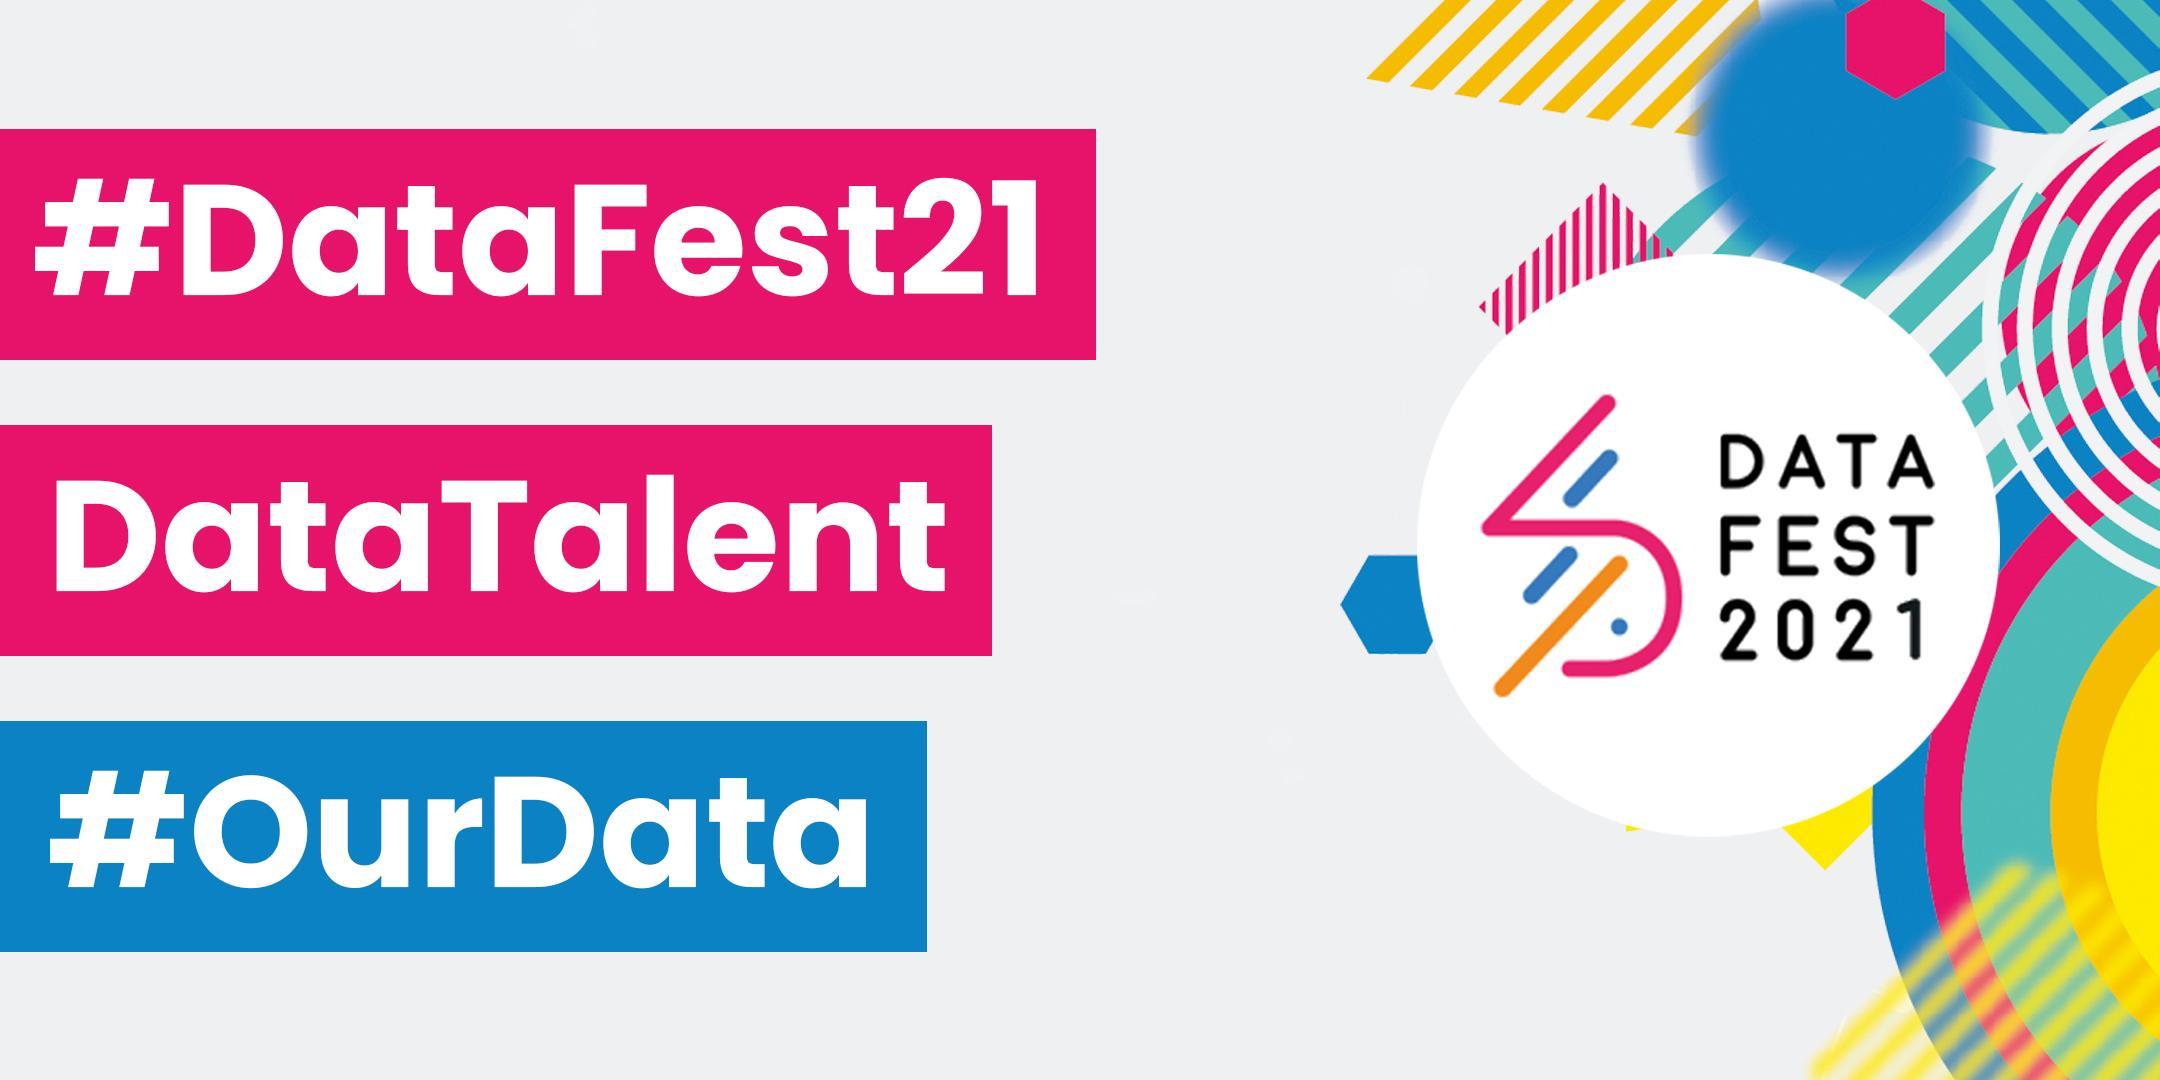 #DataFest21 Data Talent #OurData